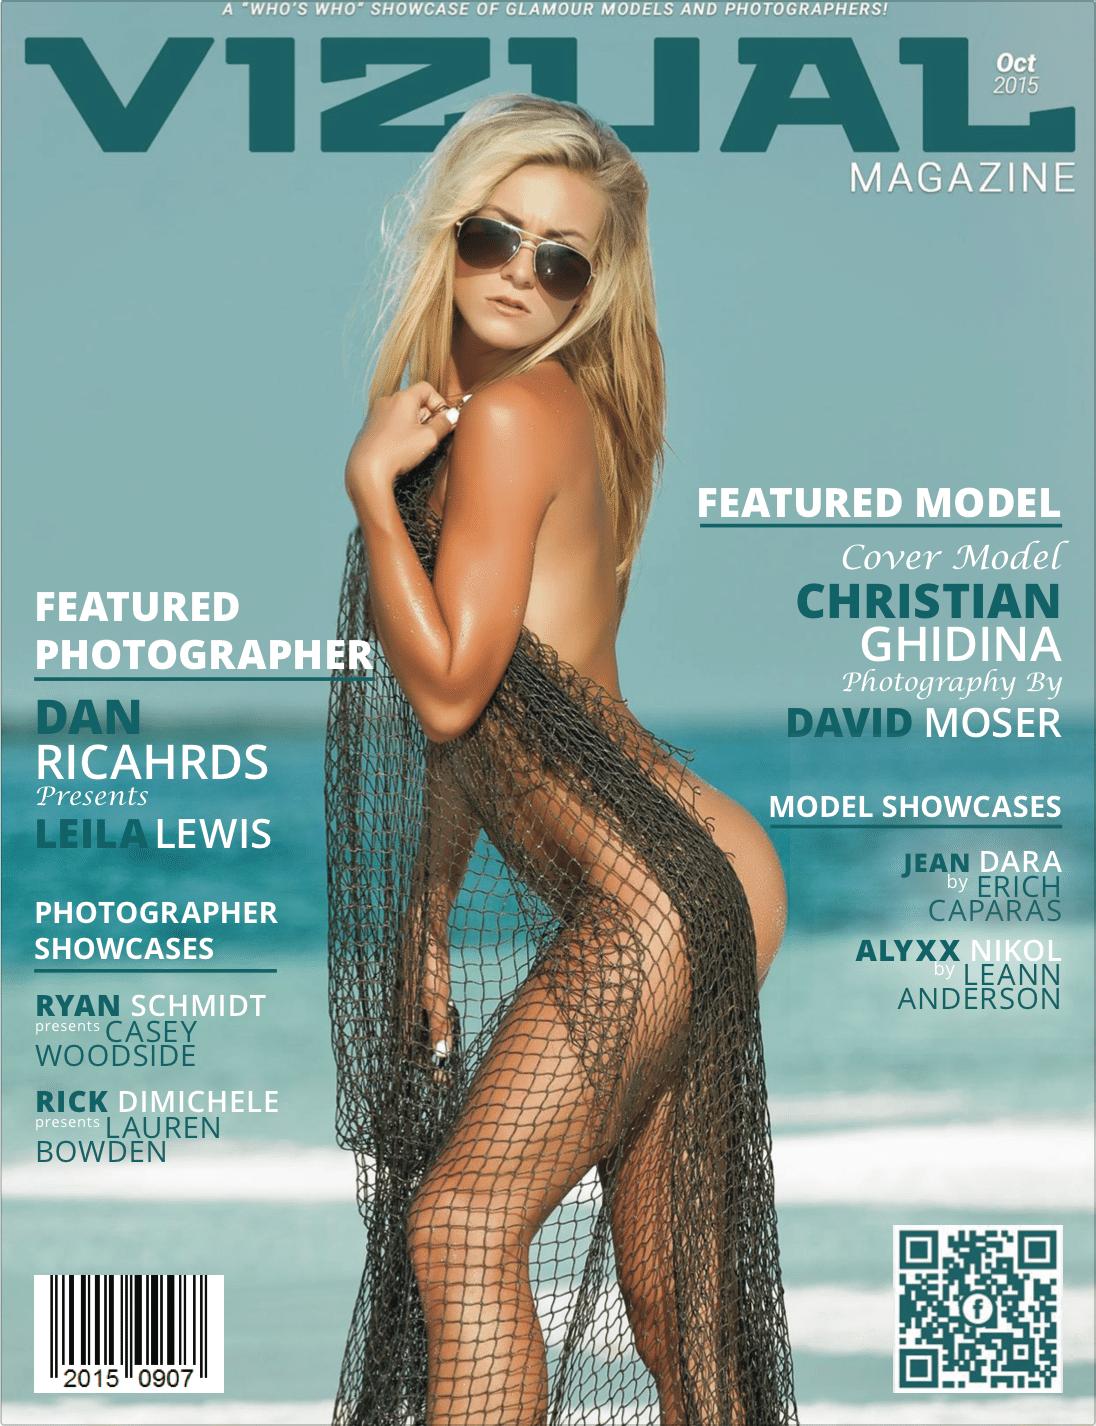 Vizual Magazine Vol 9 - October 2015 1